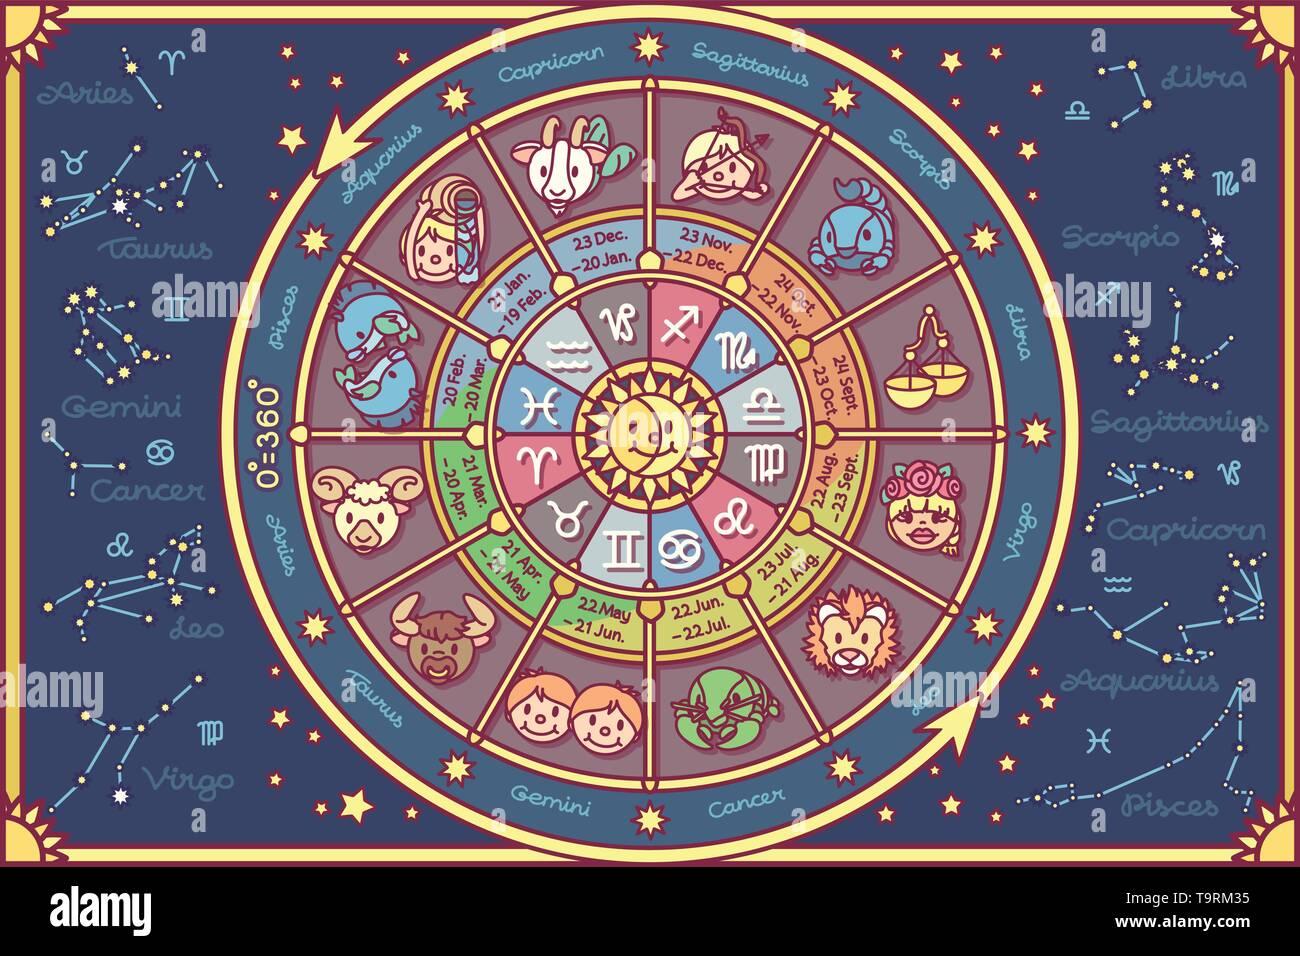 Horoscope Calendar.Vector Cute Zodiac Circle Horoscope Calendar Poster Stock Vector Art